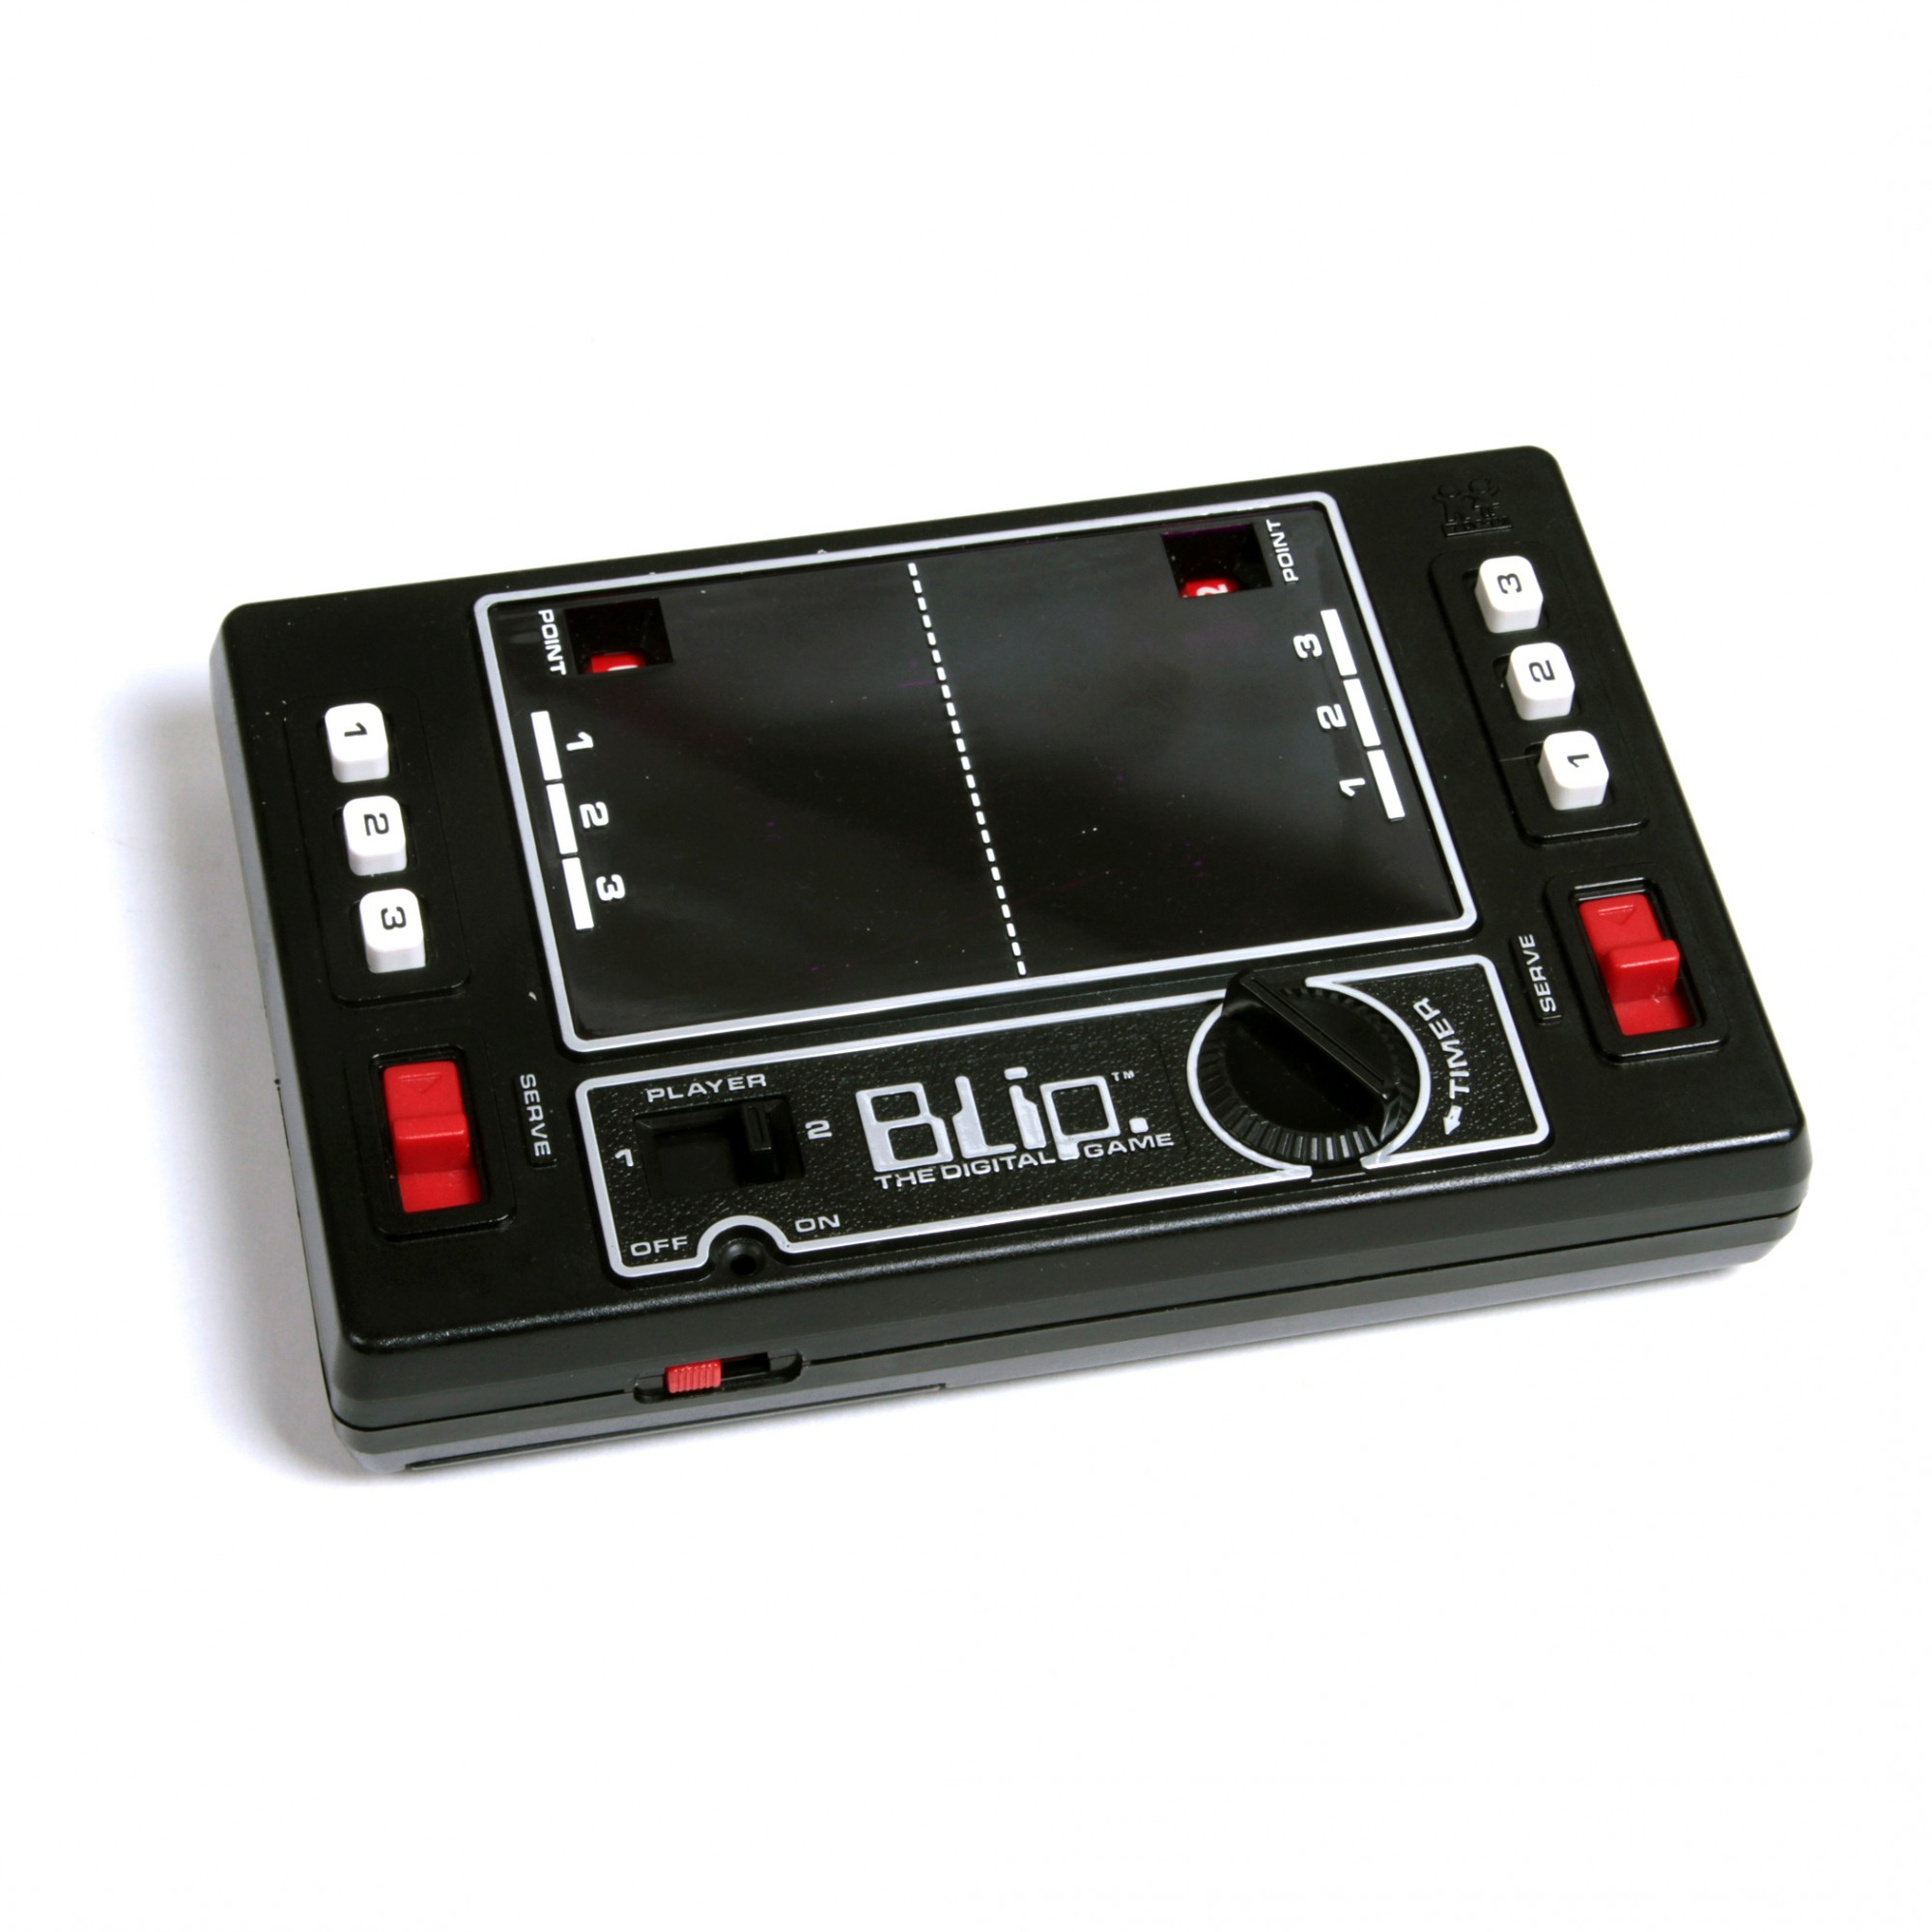 Blip: The Digital Game 1977 [Tomy]